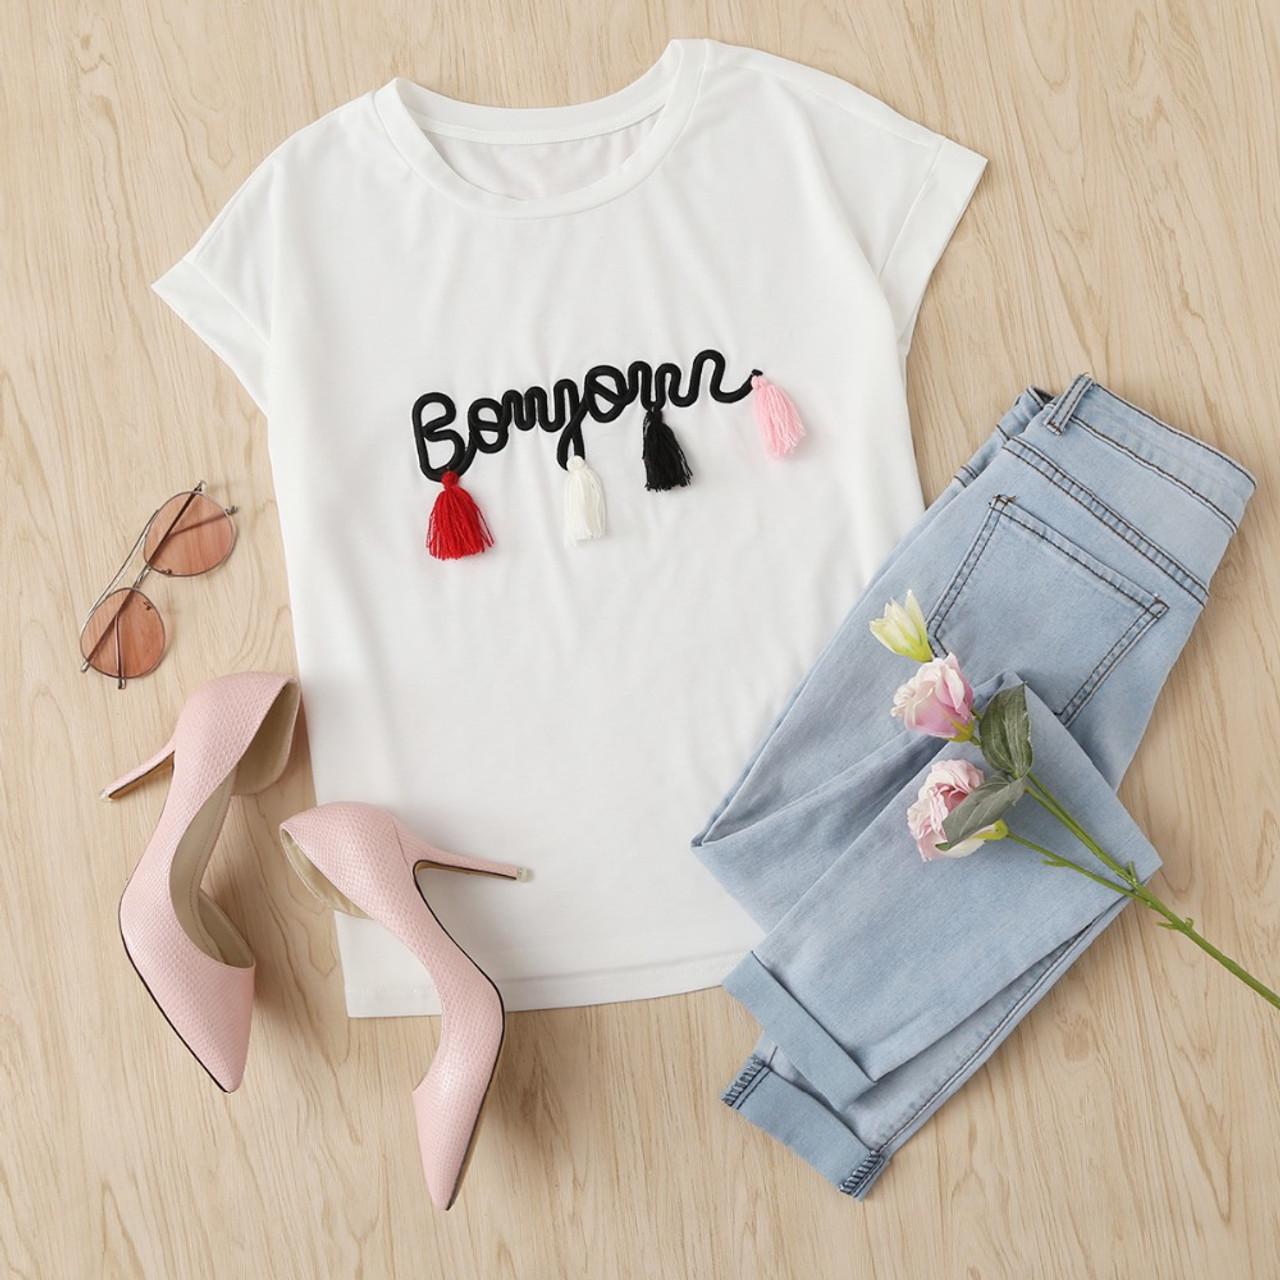 f15653245 ... SHEIN T shirt Women Tops Summer O-neck T shirt Batwing Sleeve Tassel  Detail Embroidery ...